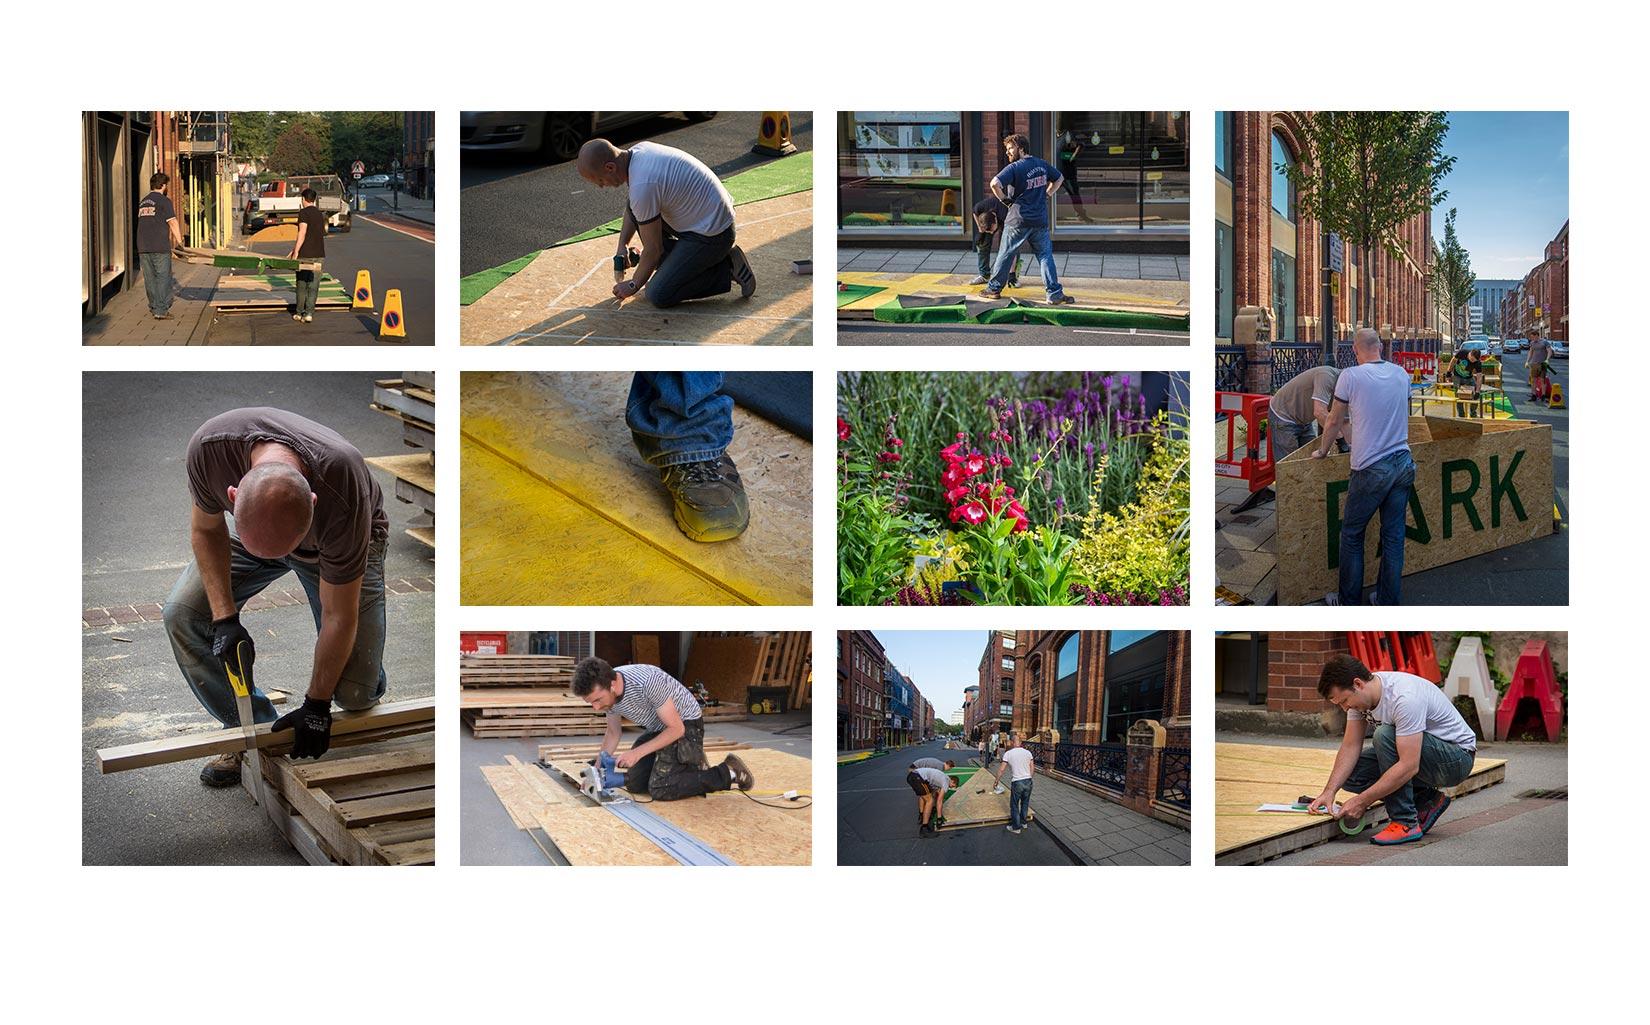 PARK HERE, Leeds, Construction